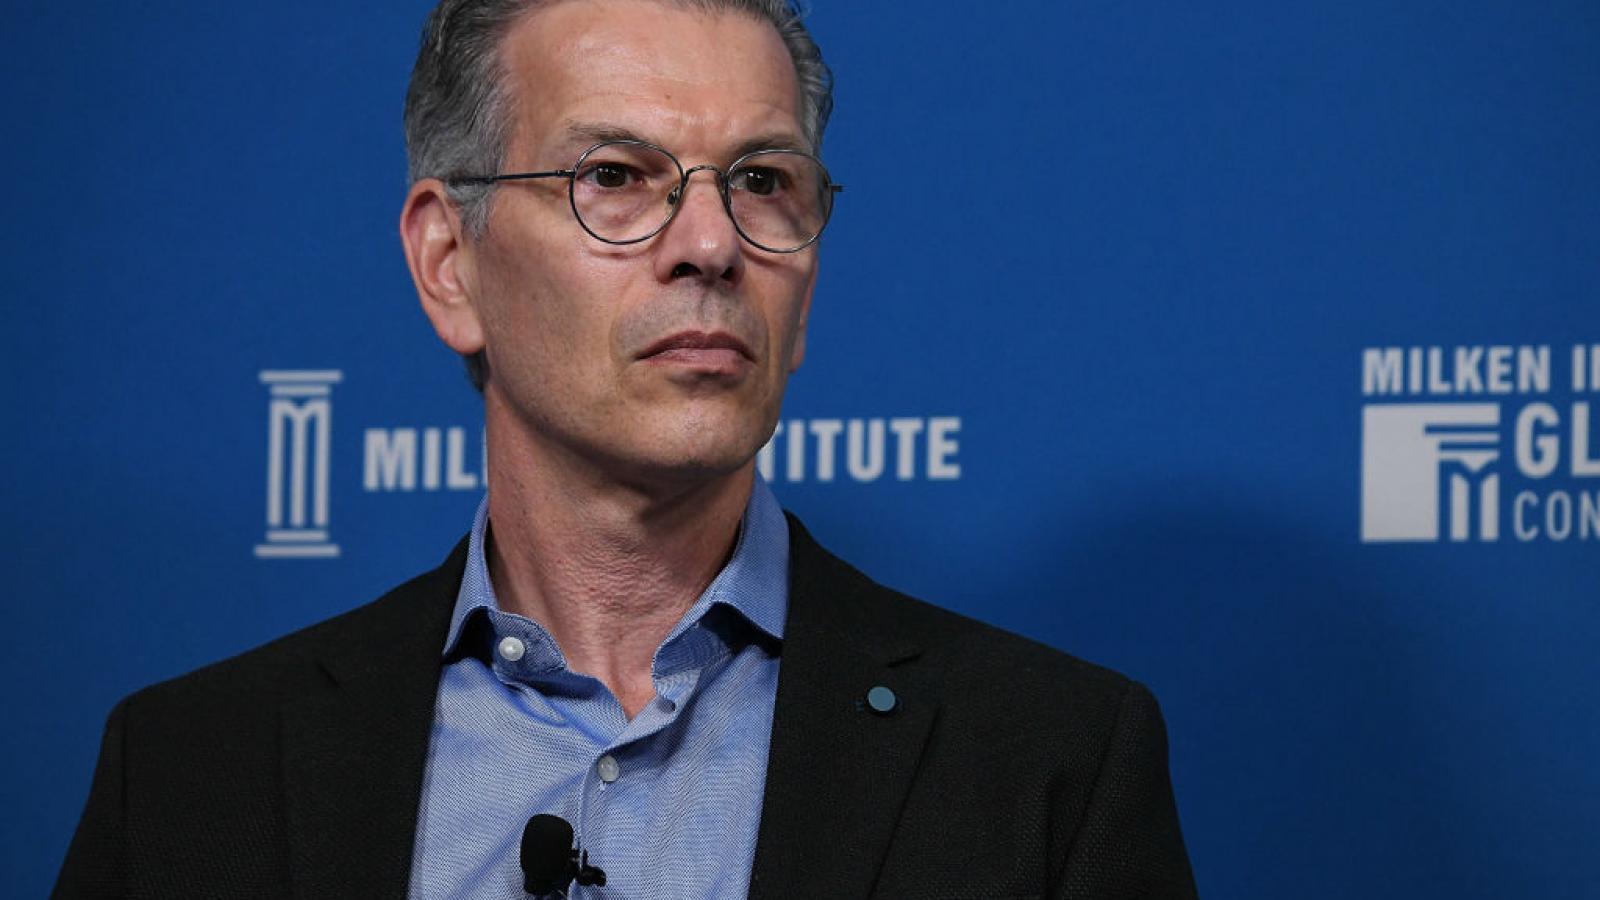 Dr. David Feinberg, head of Google Health